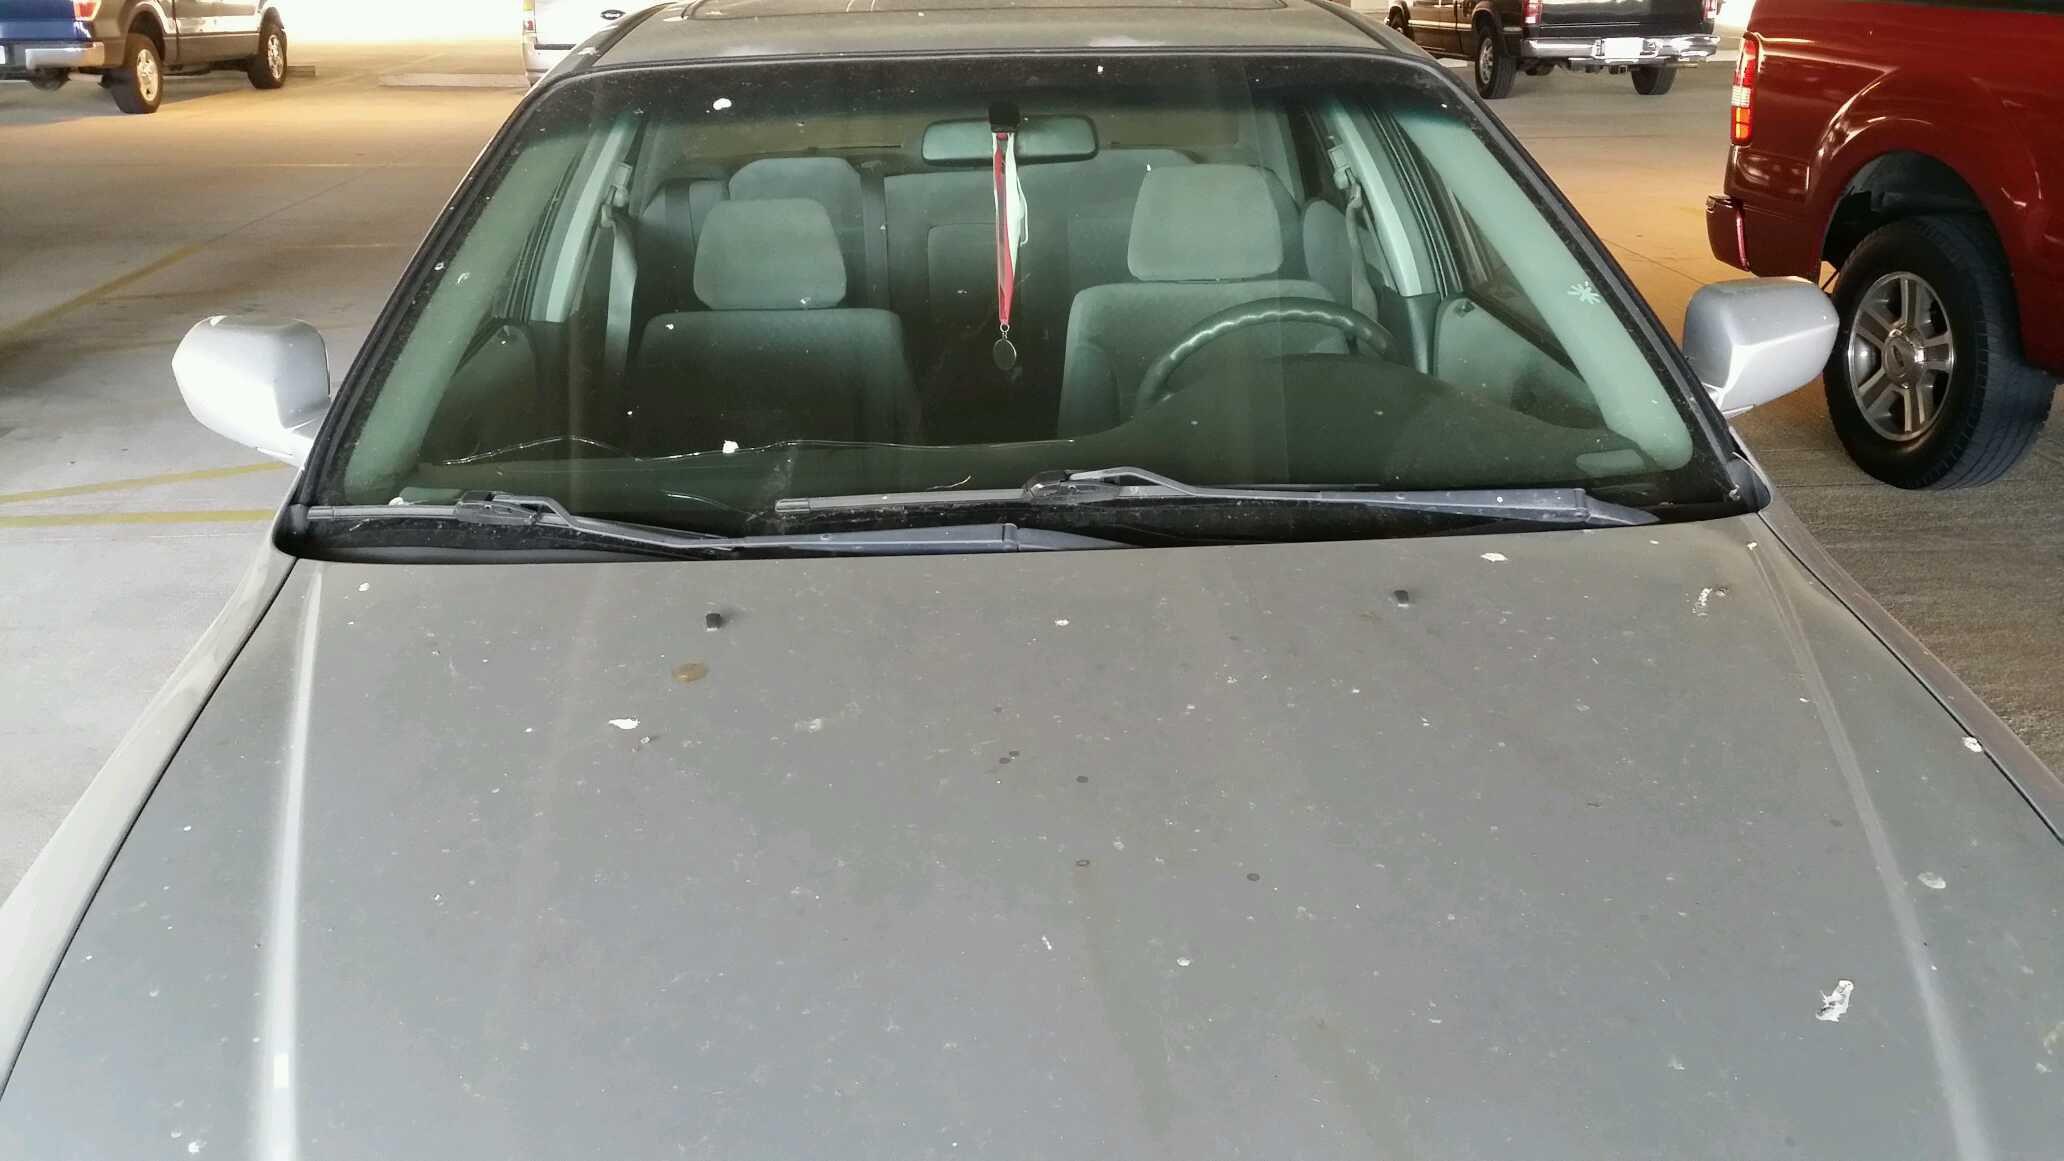 2002 honda accord 4 door sedan windshield. Black Bedroom Furniture Sets. Home Design Ideas